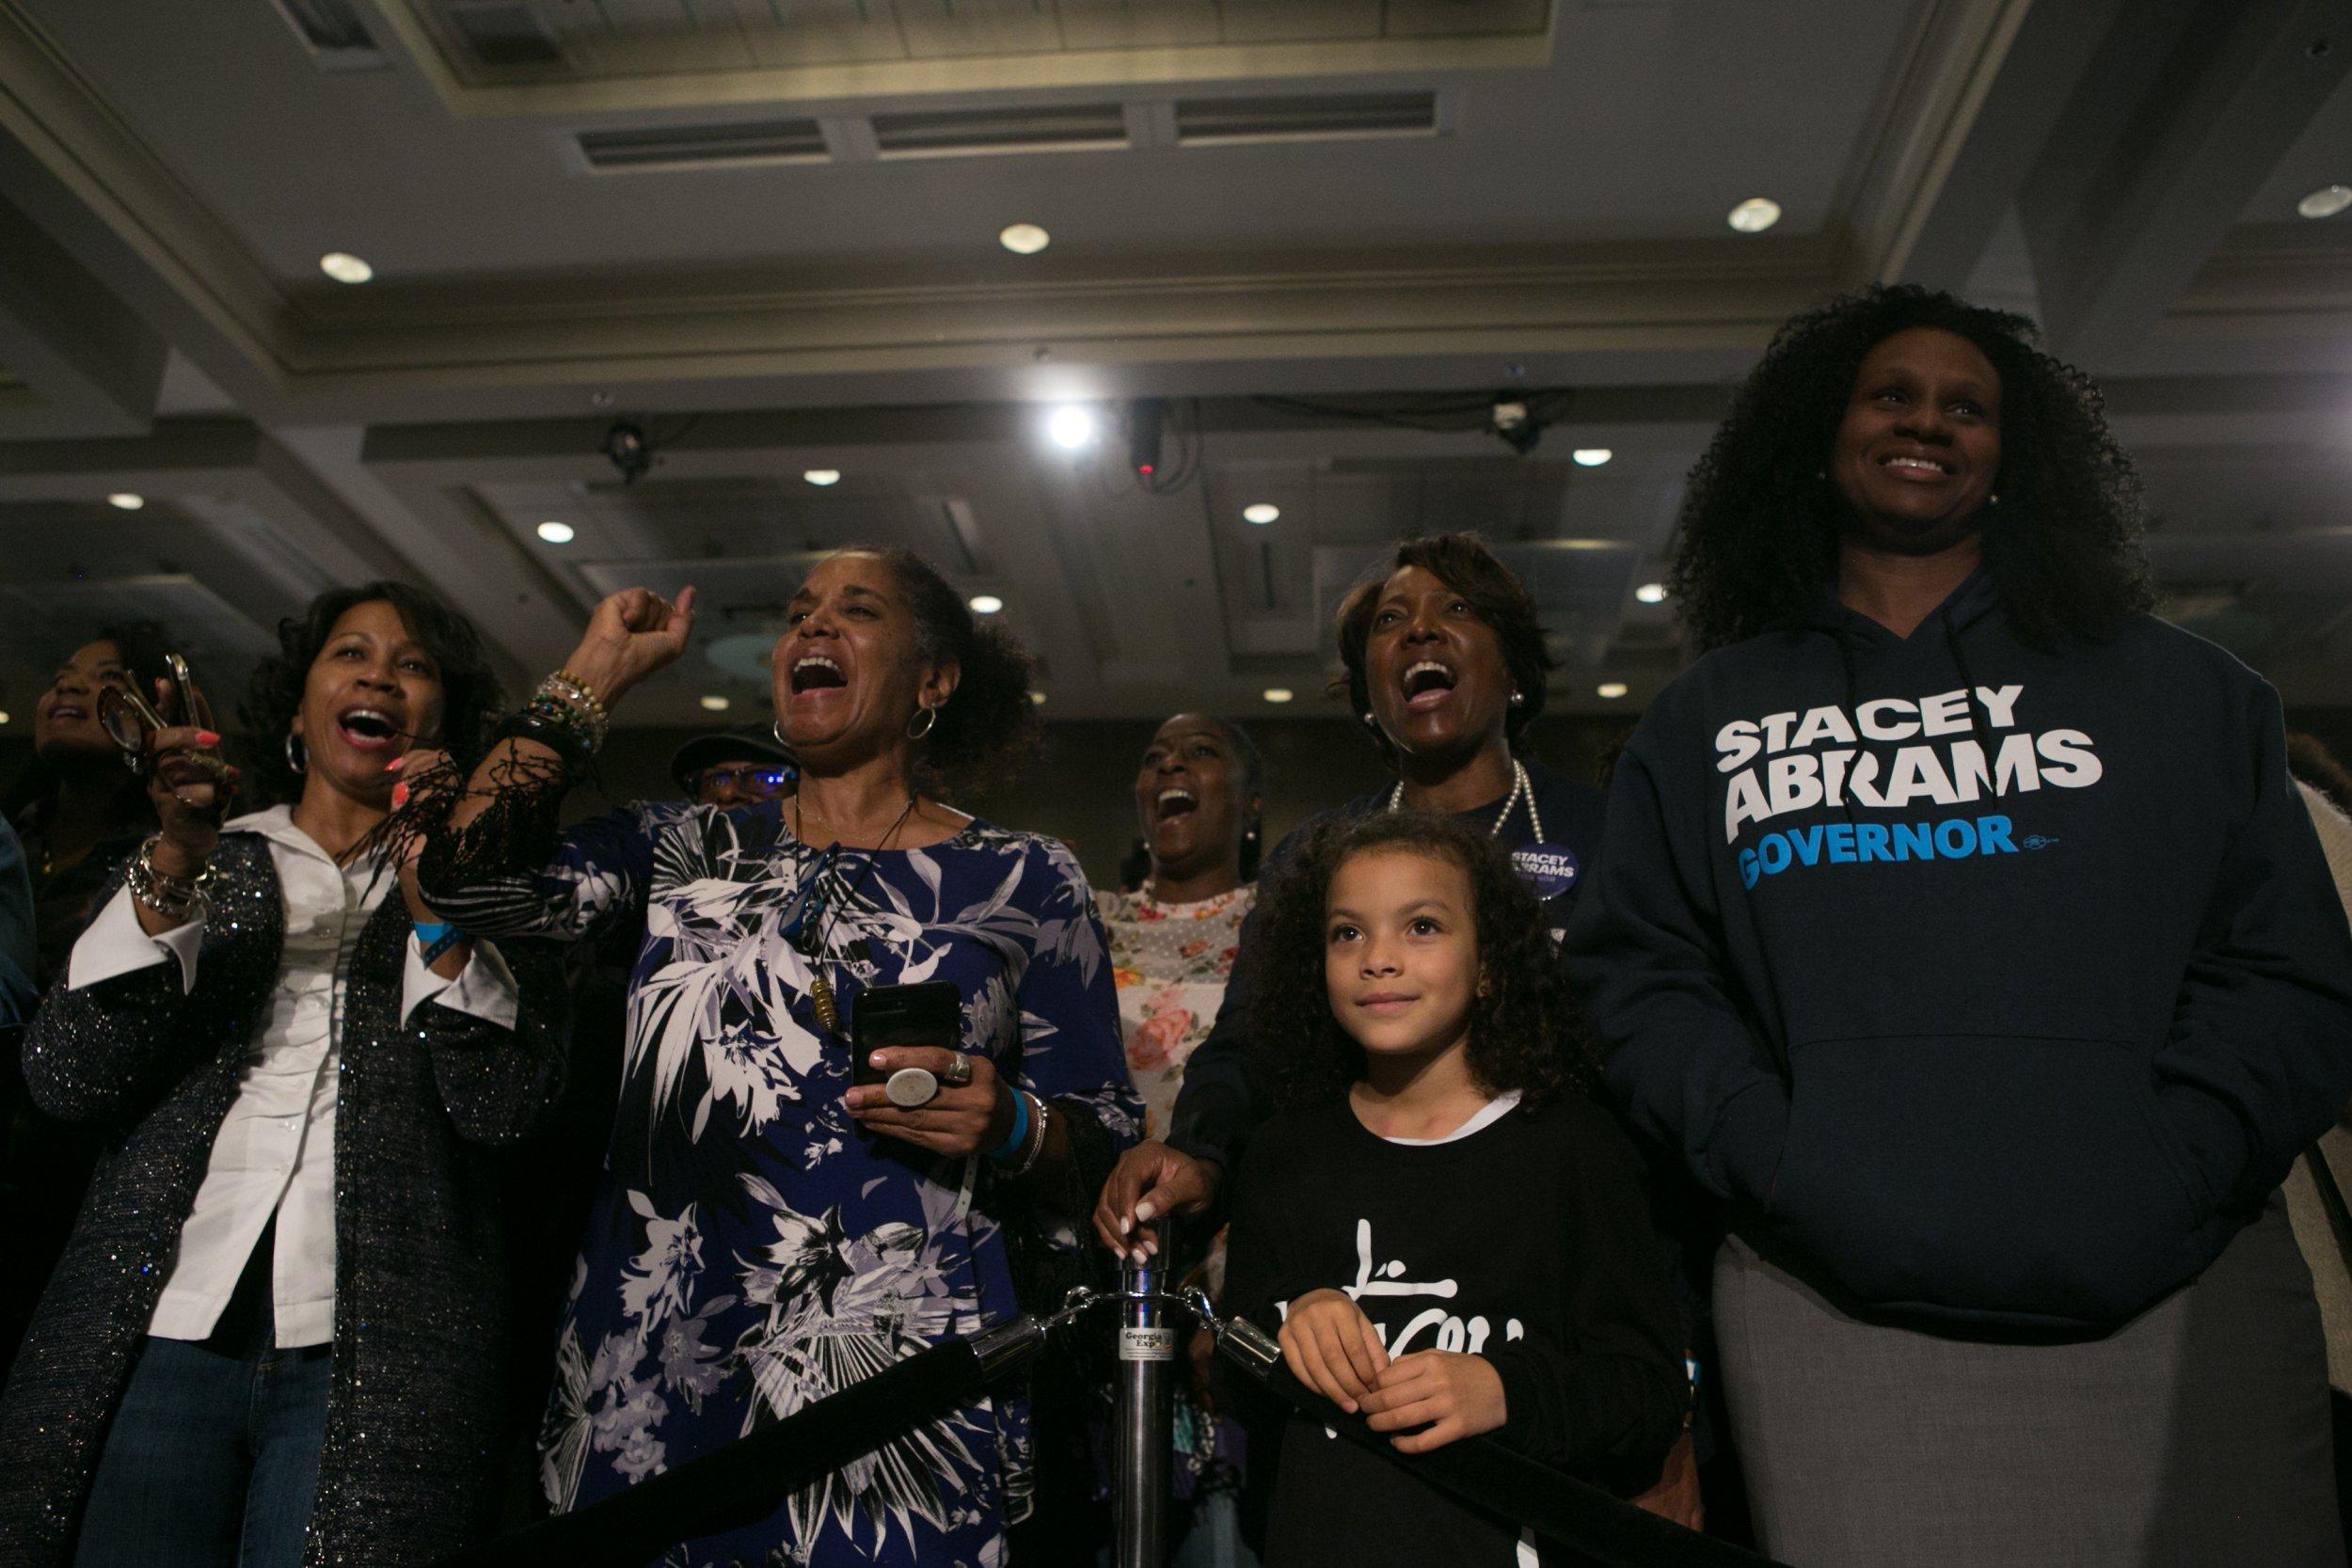 stacey abrams, georgia, governor, race, state senator